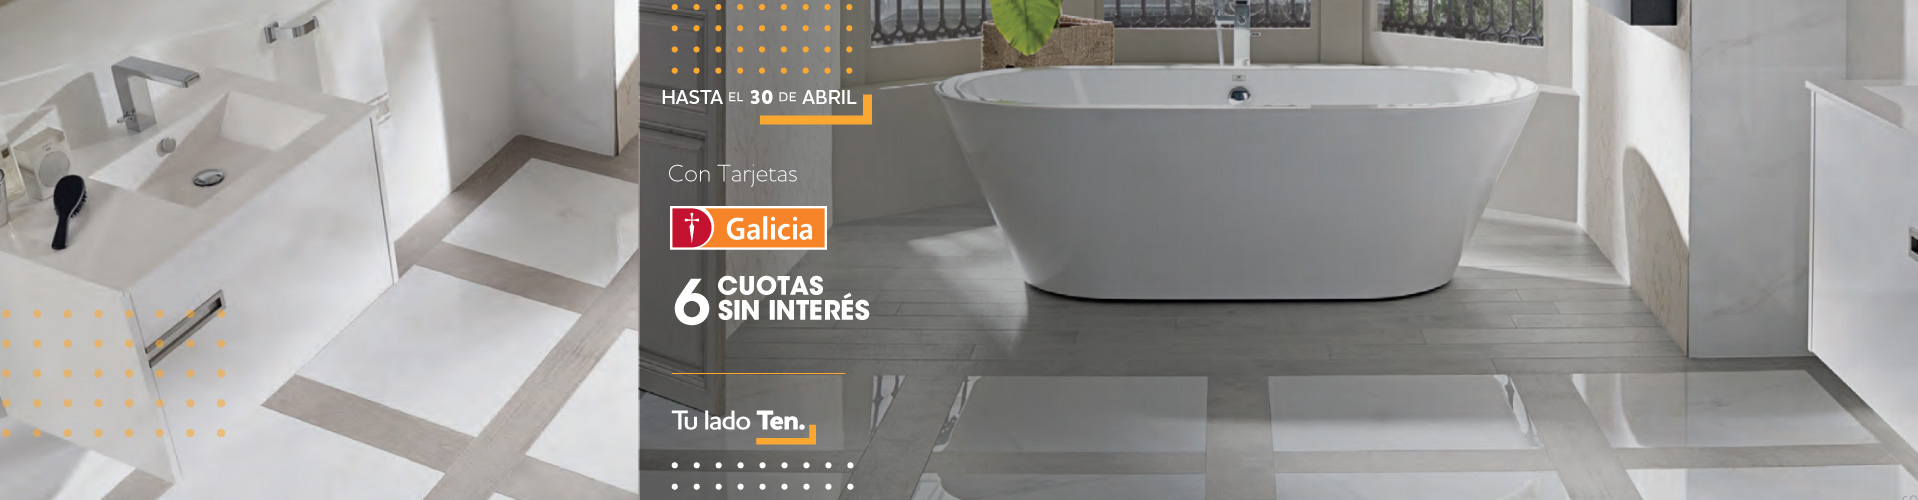 6 cuotas galicia